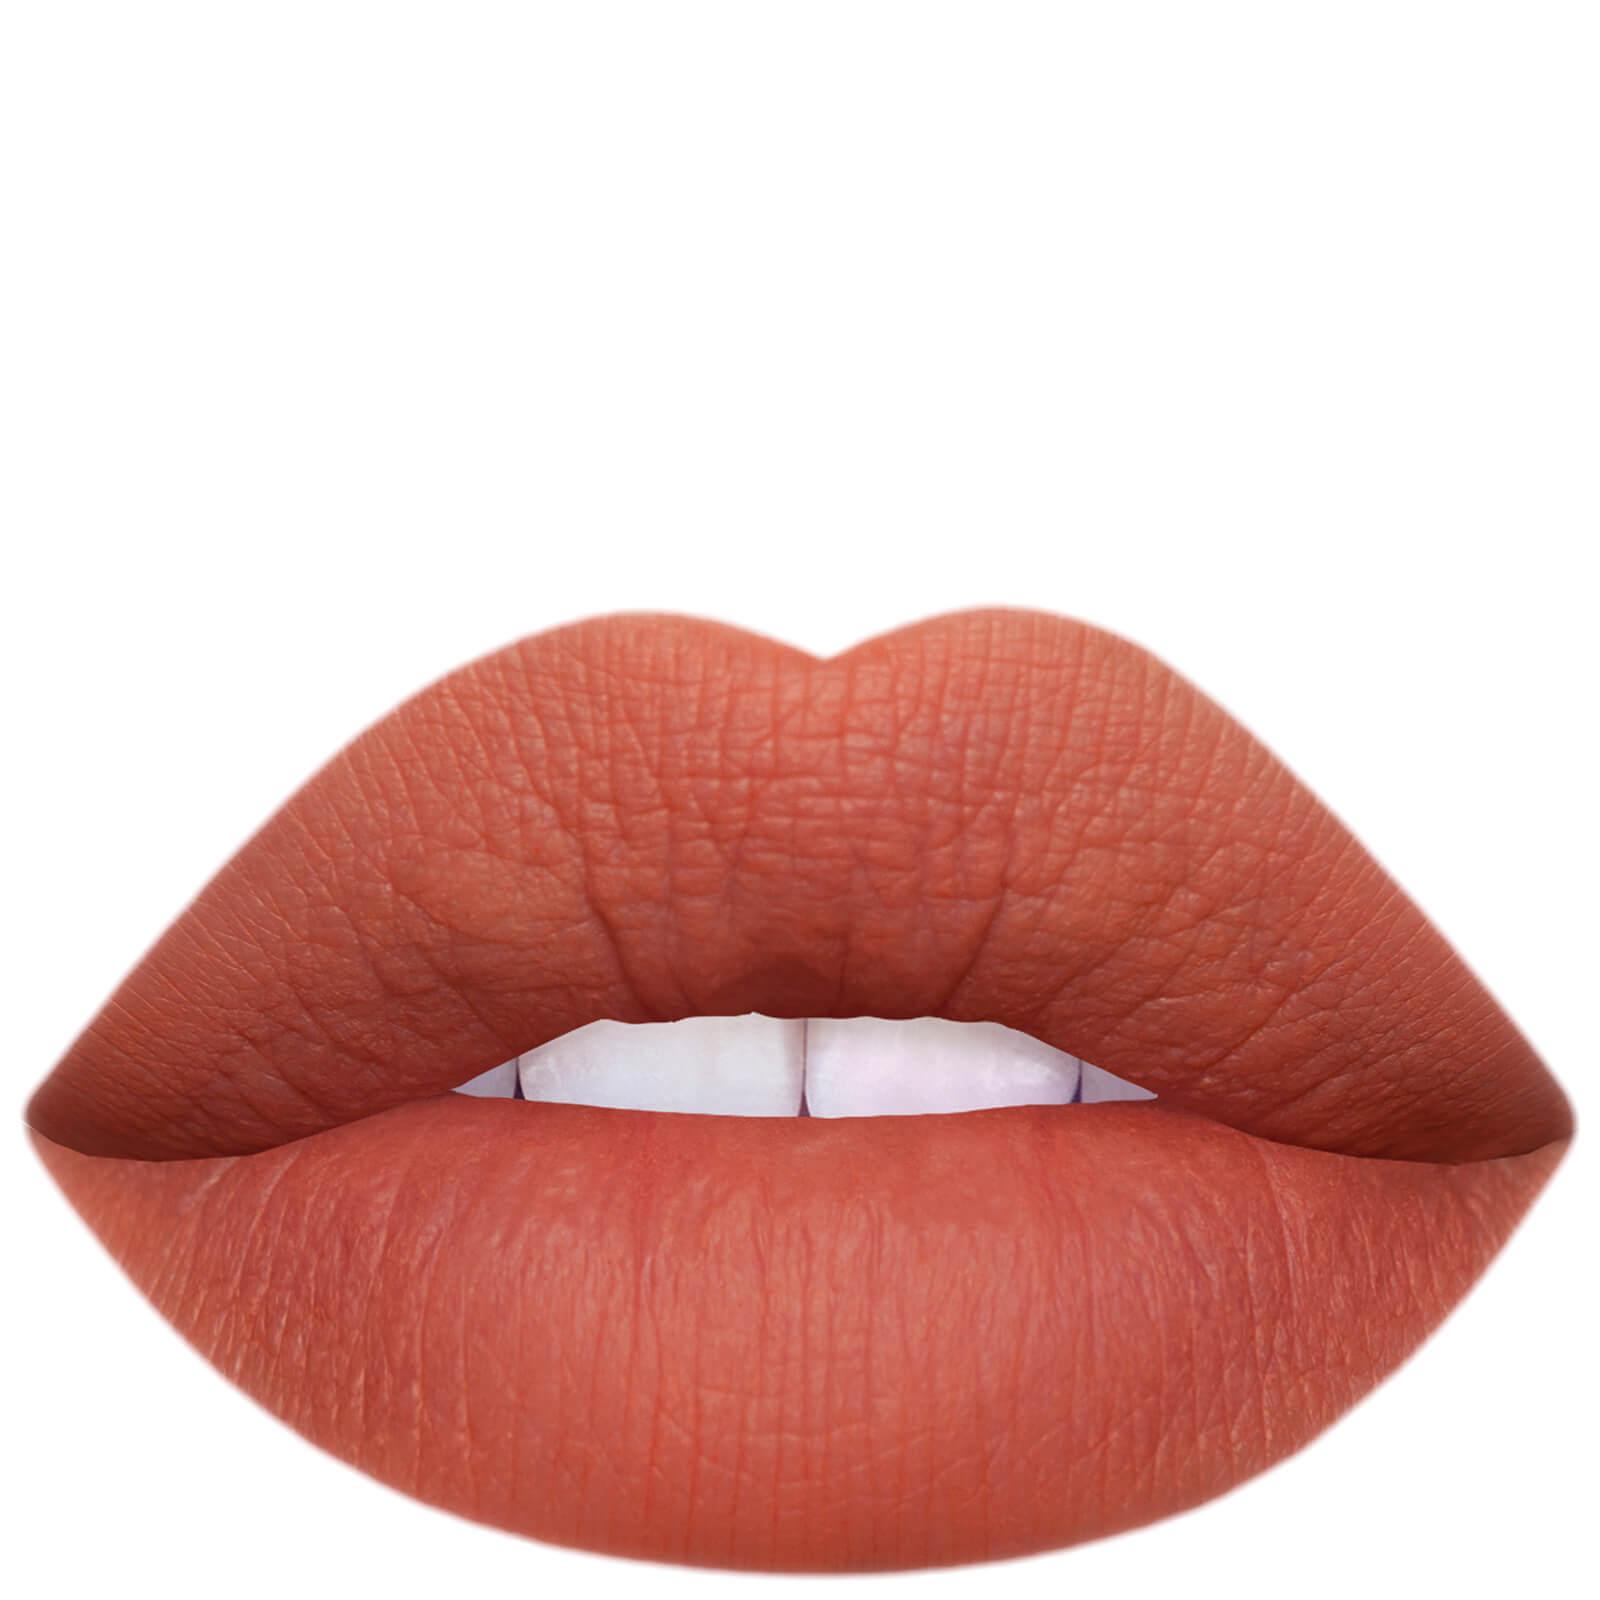 Lime Crime Plushies Lipstick (Various Shades) - Marmalade